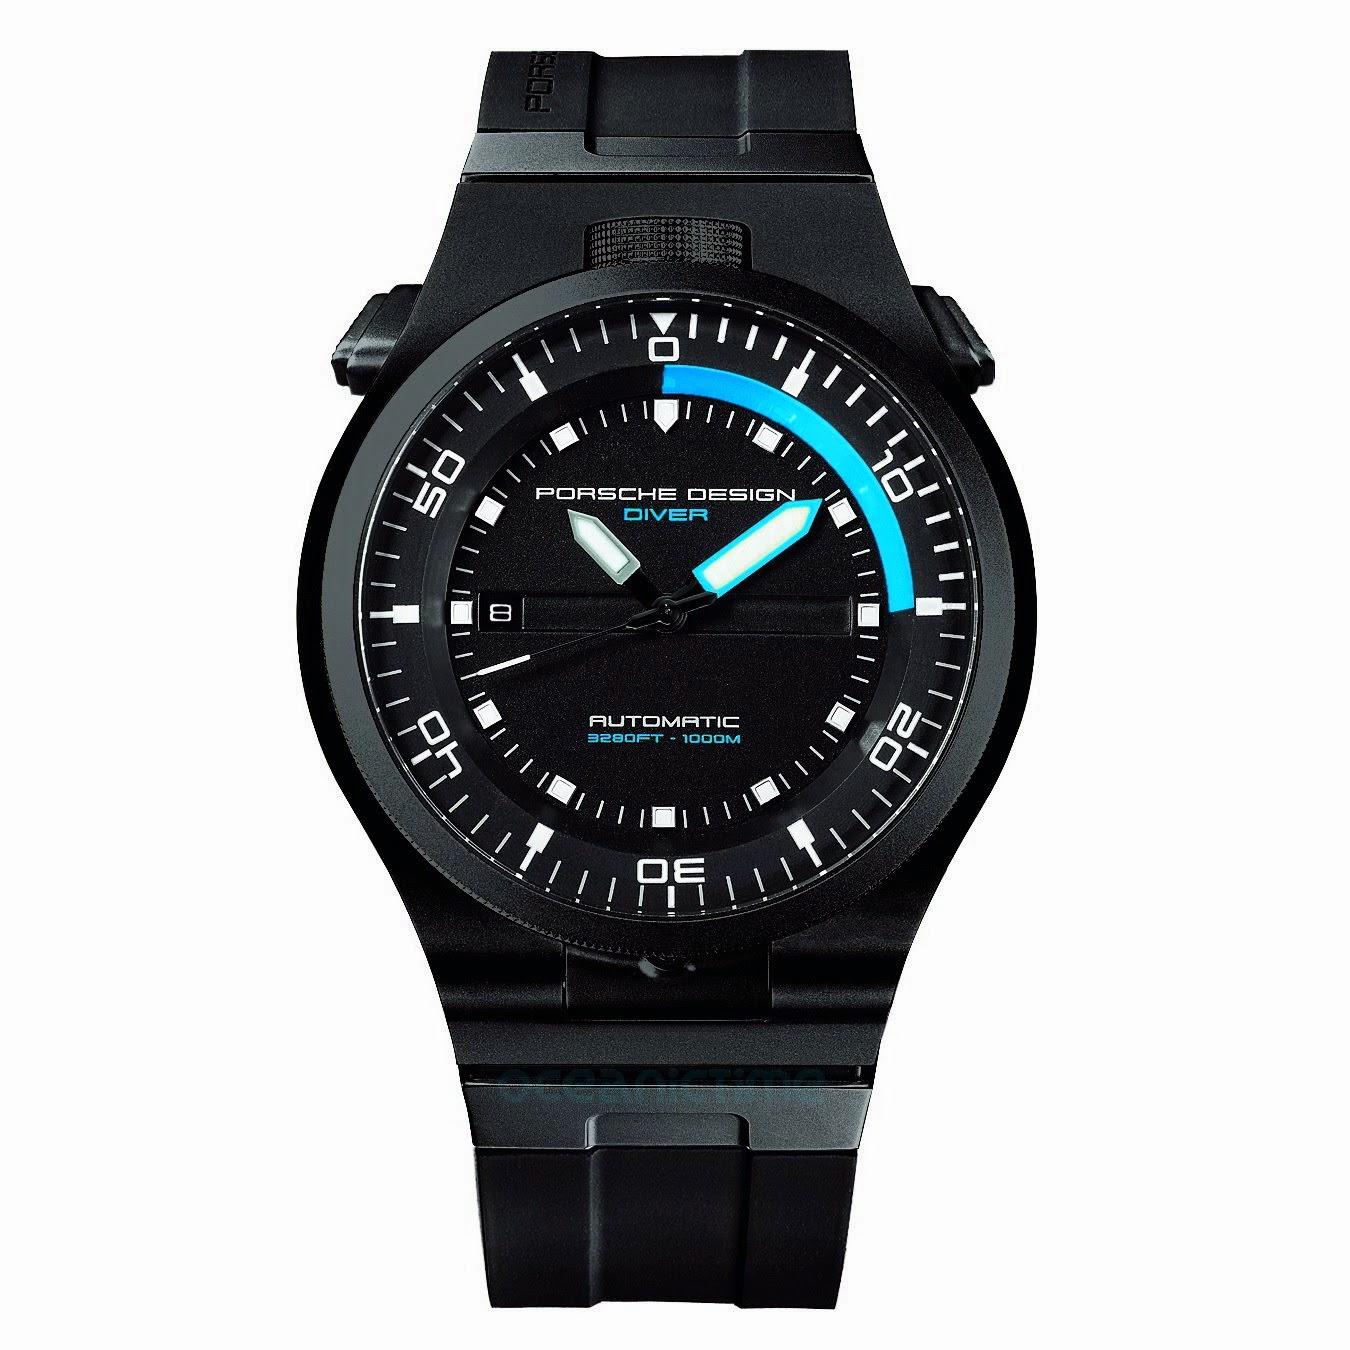 swiss design watches the p 6780 diver watch from porsche. Black Bedroom Furniture Sets. Home Design Ideas